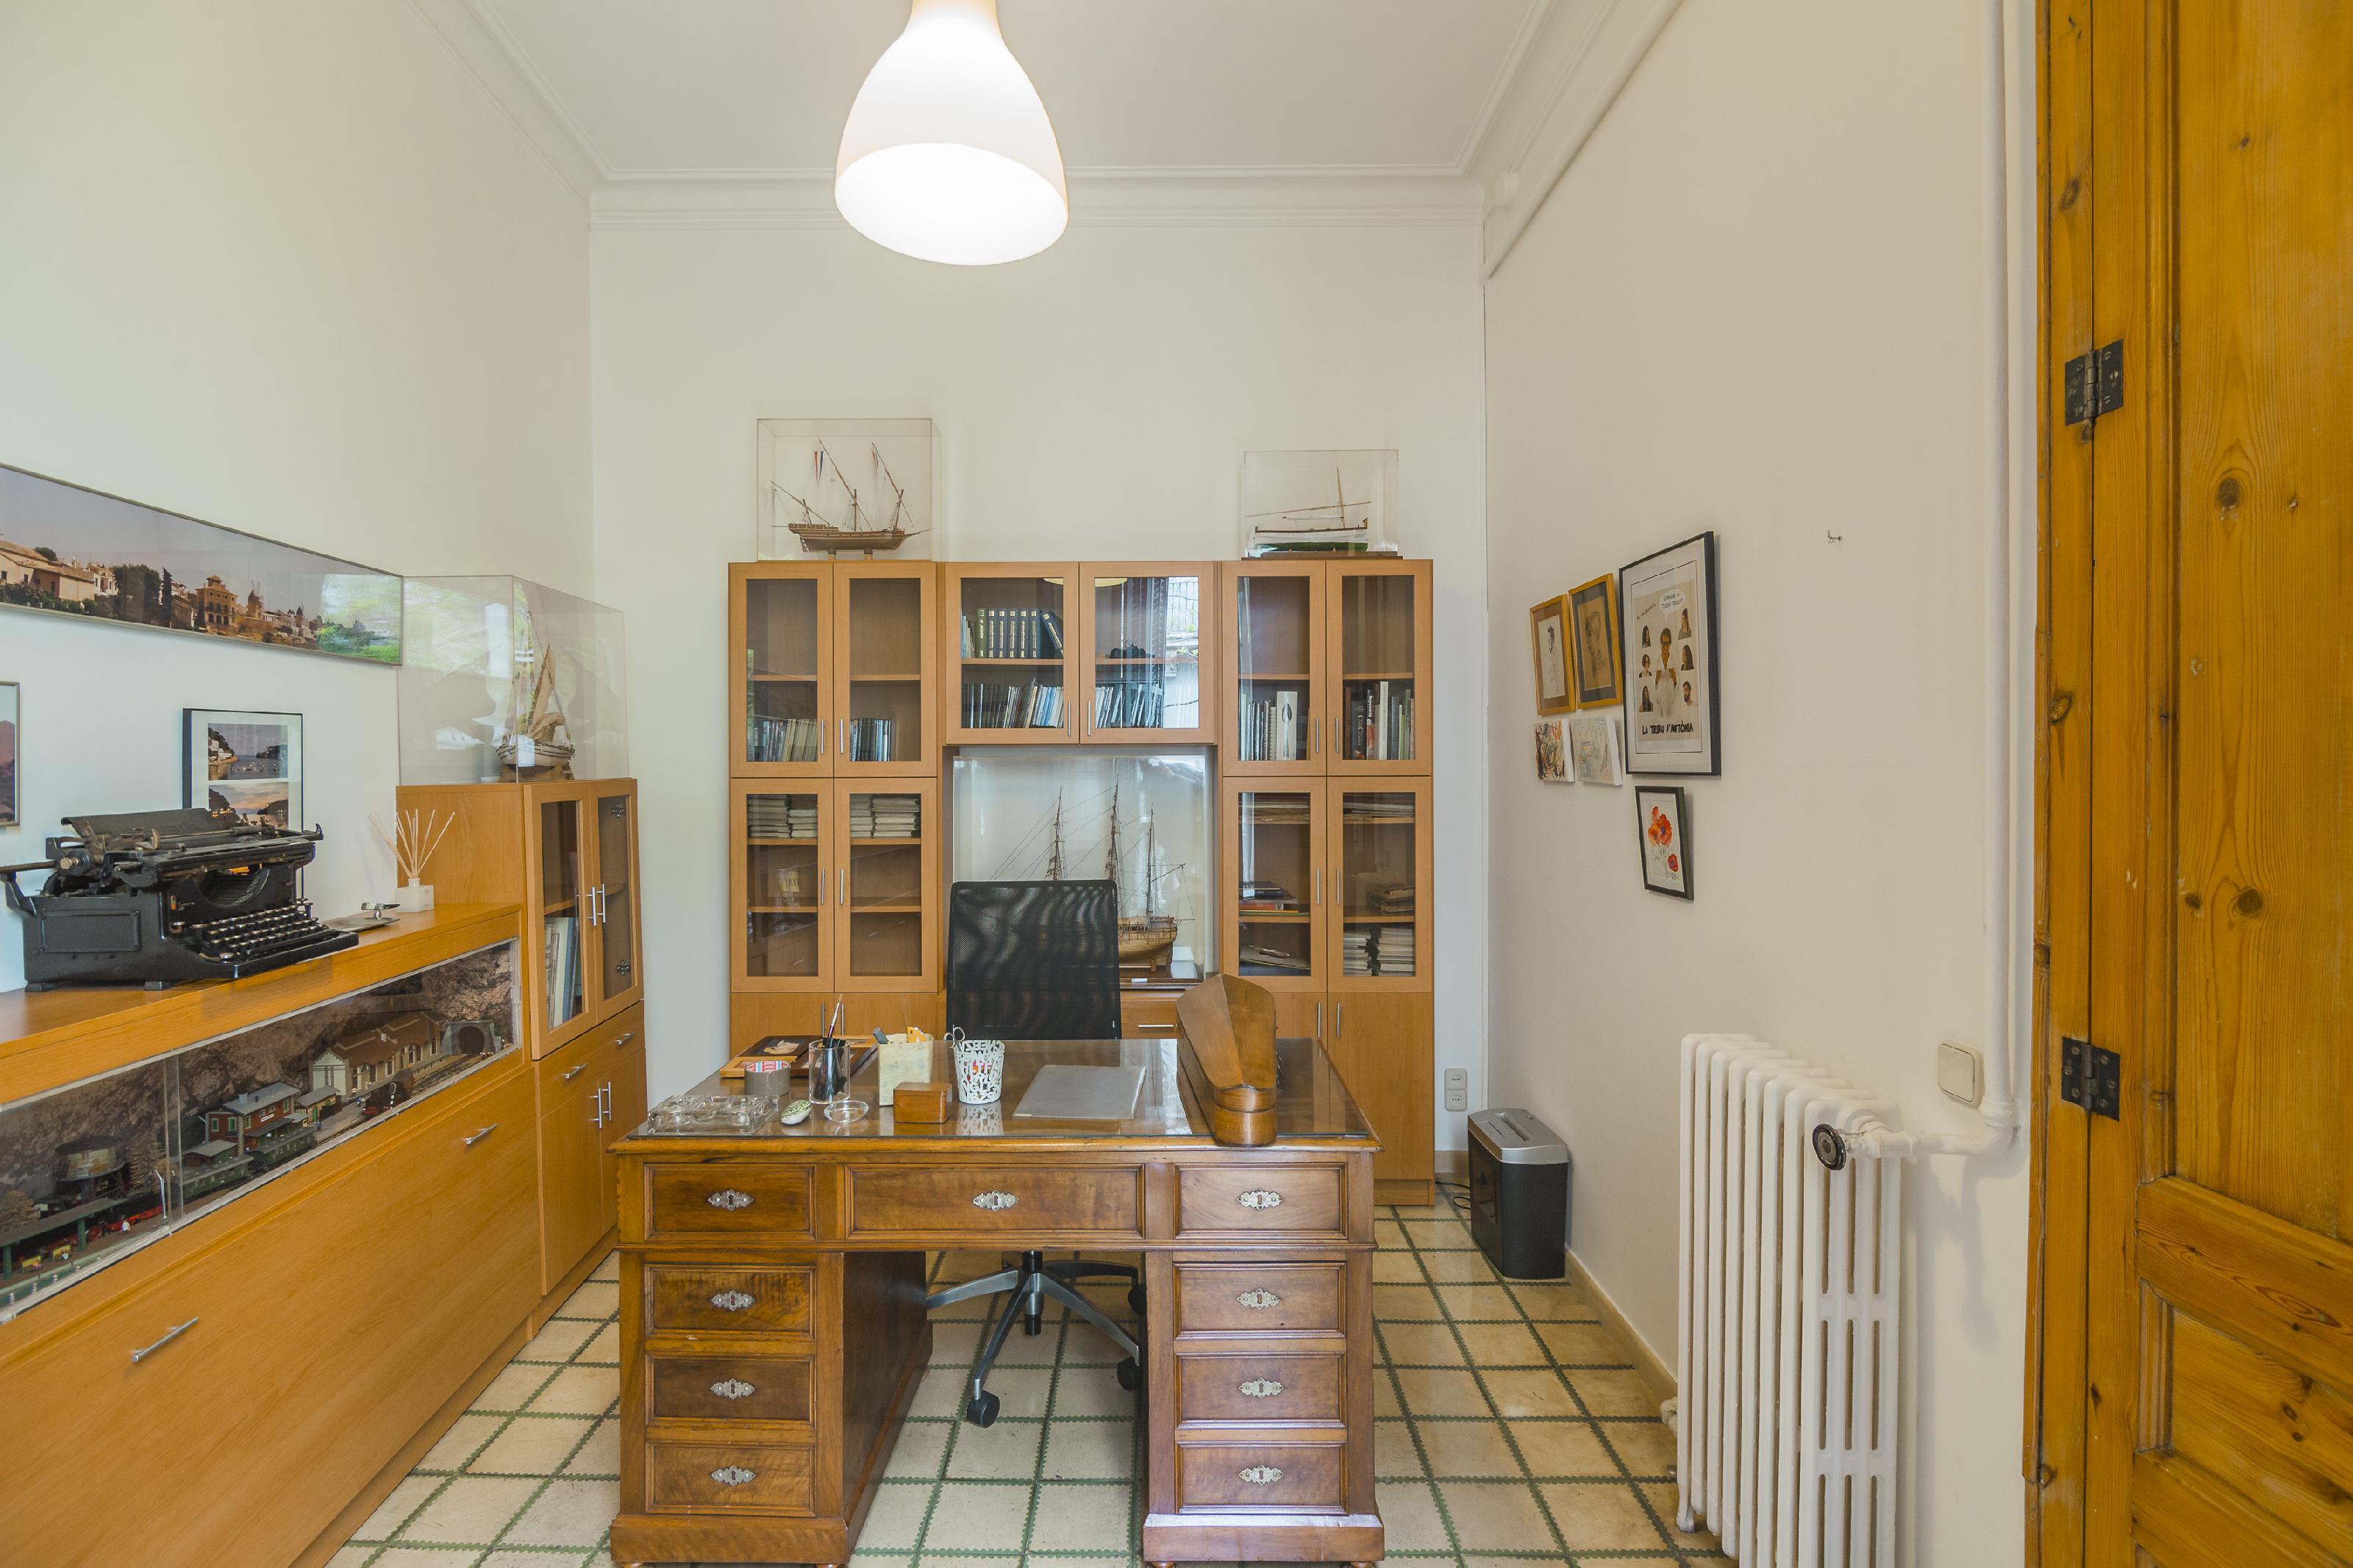 250020 Piso en venda en Gràcia, Vila de Gràcia 33